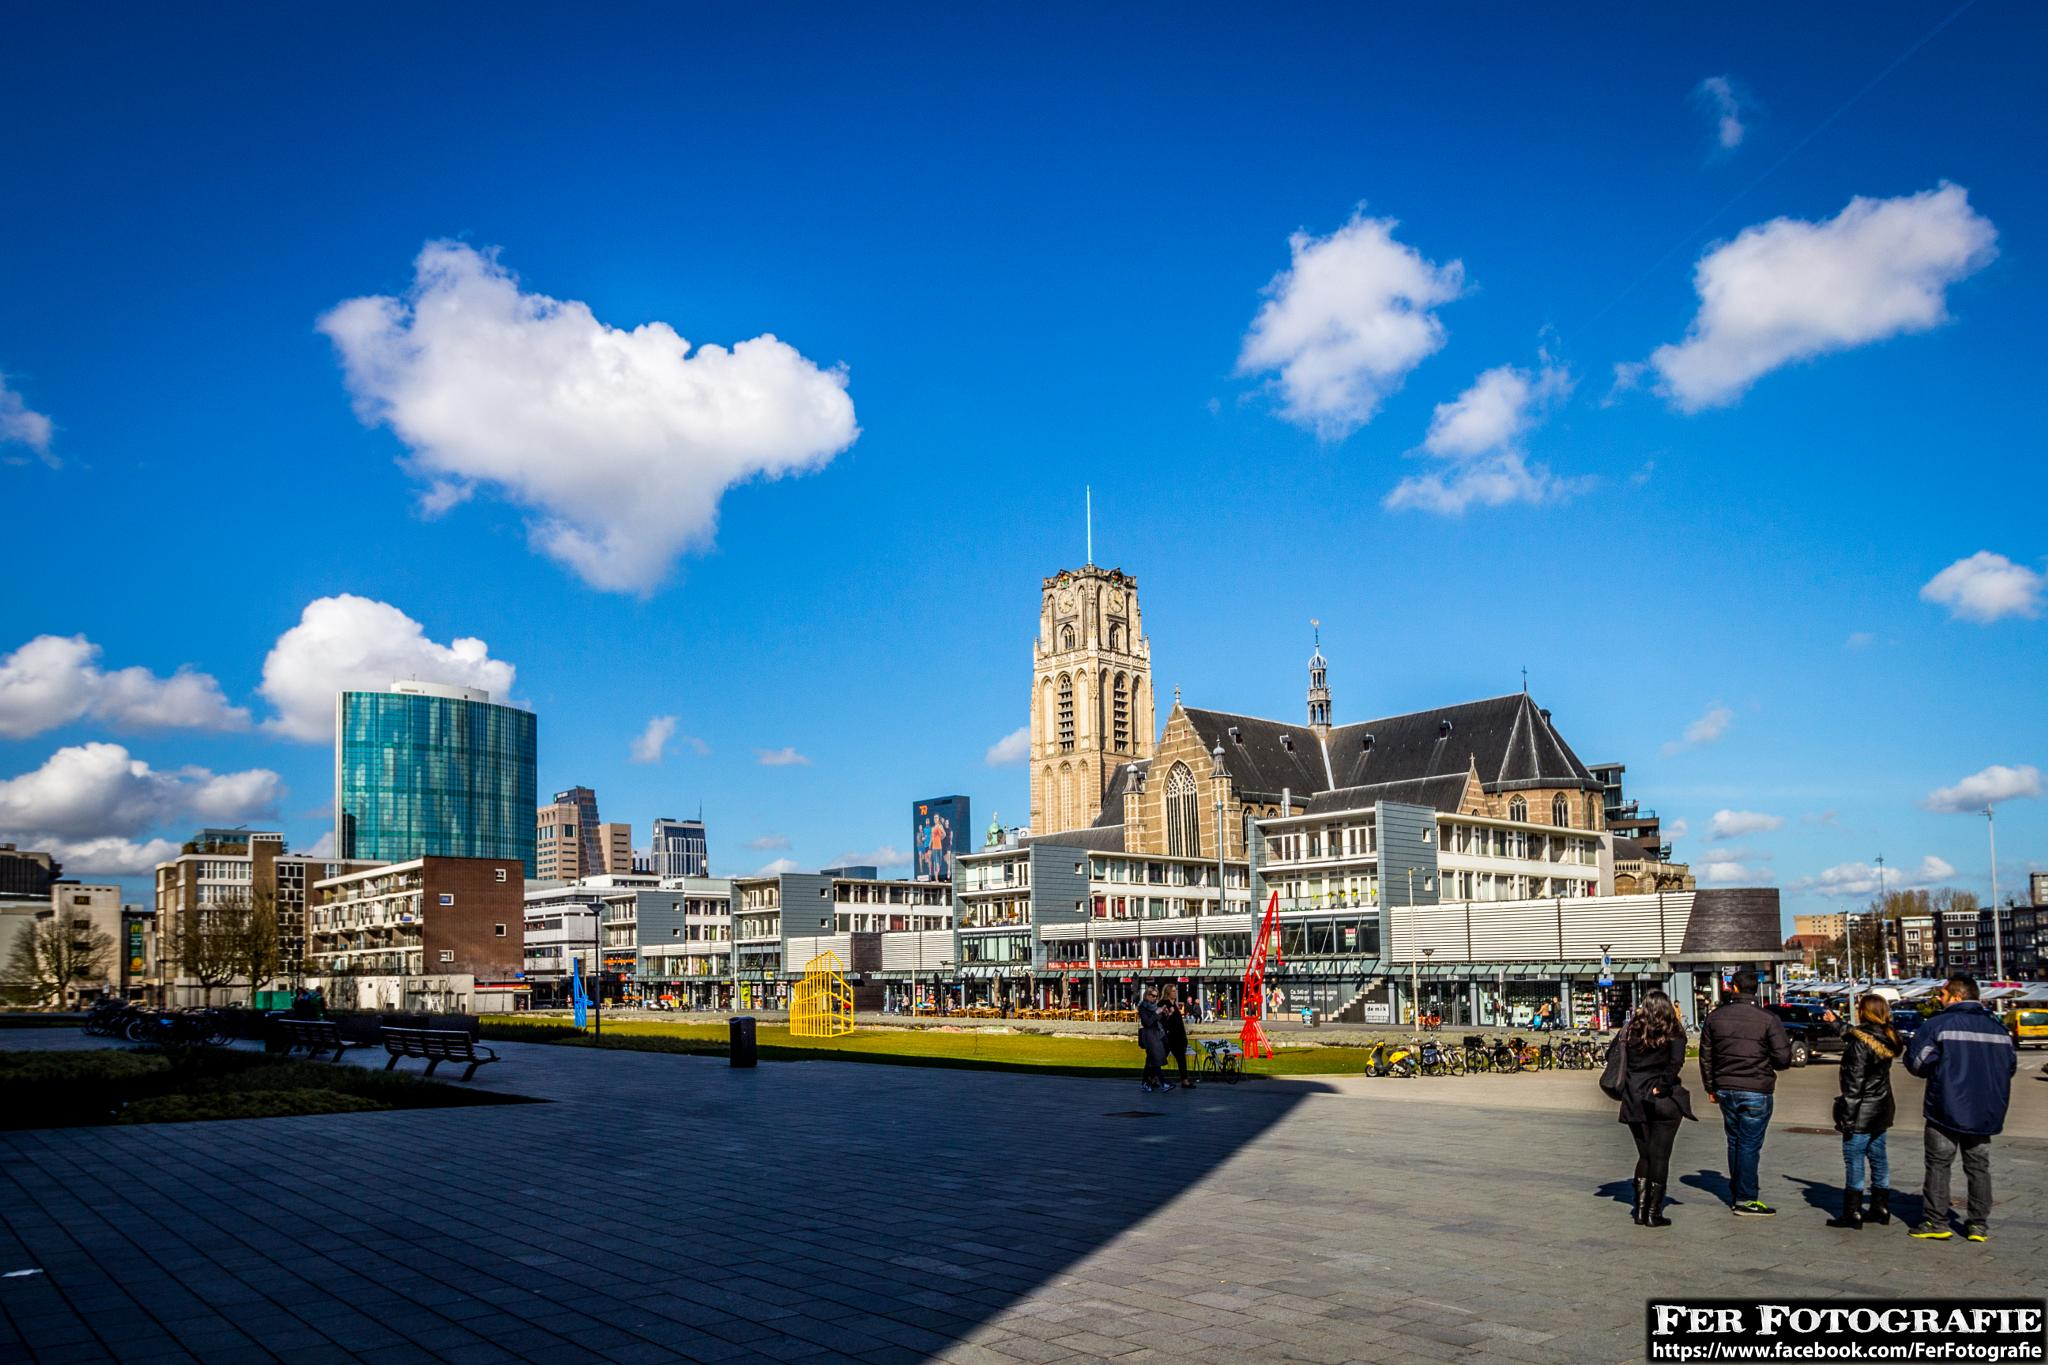 Rotterdam City Center view from Blaak by Fer Herwaarden